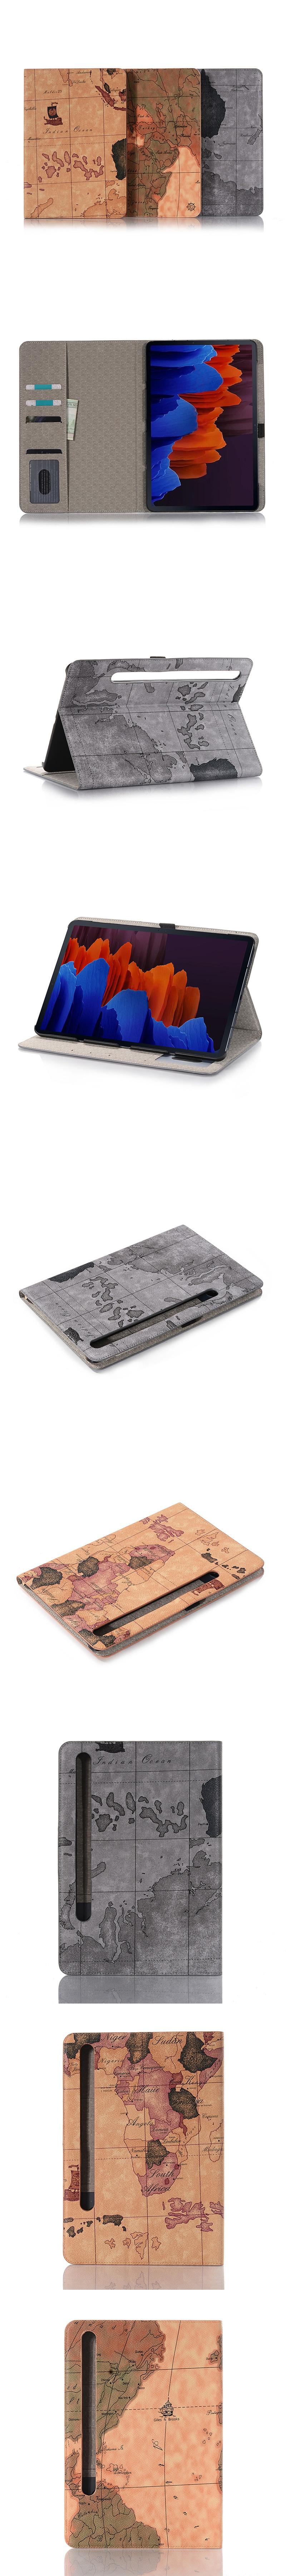 375-Samsung-經典地圖紋翻蓋皮套支架平板套(Tab S7)